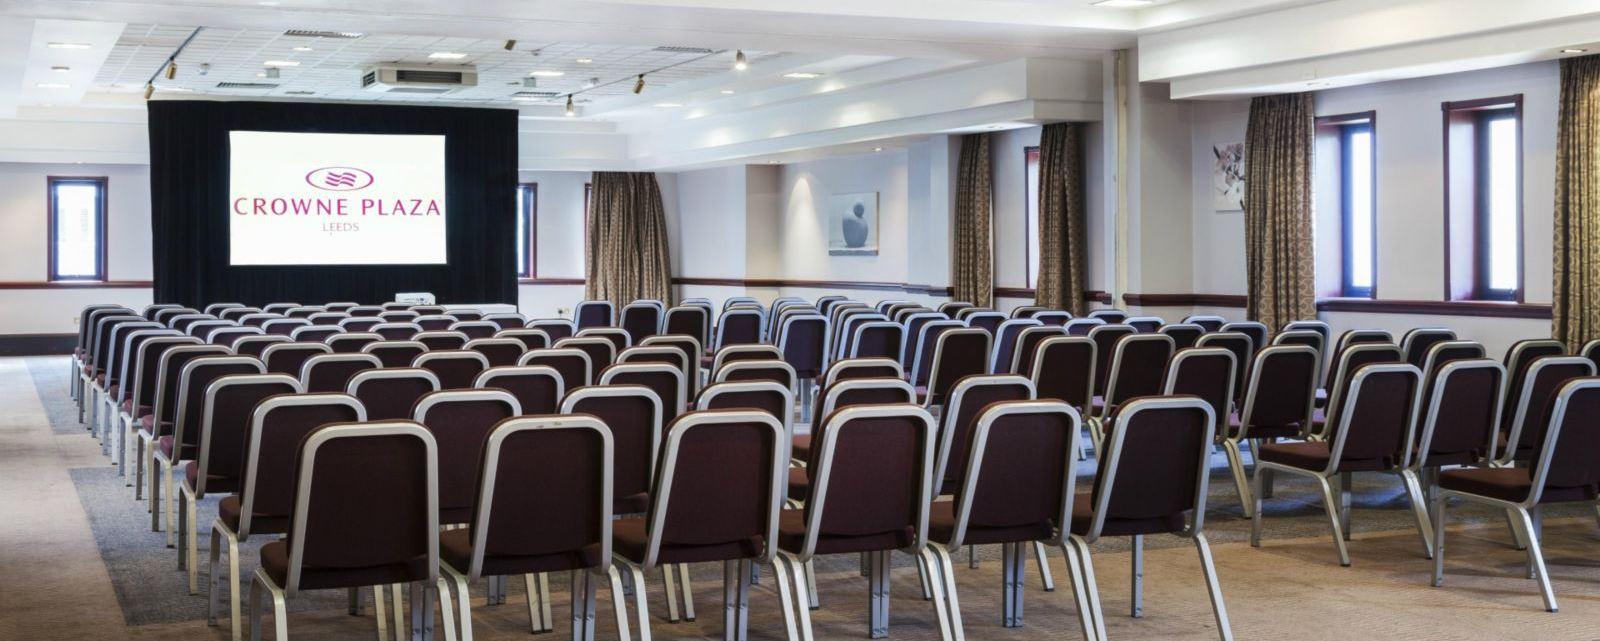 Crowne Plaza Leeds meeting rooms